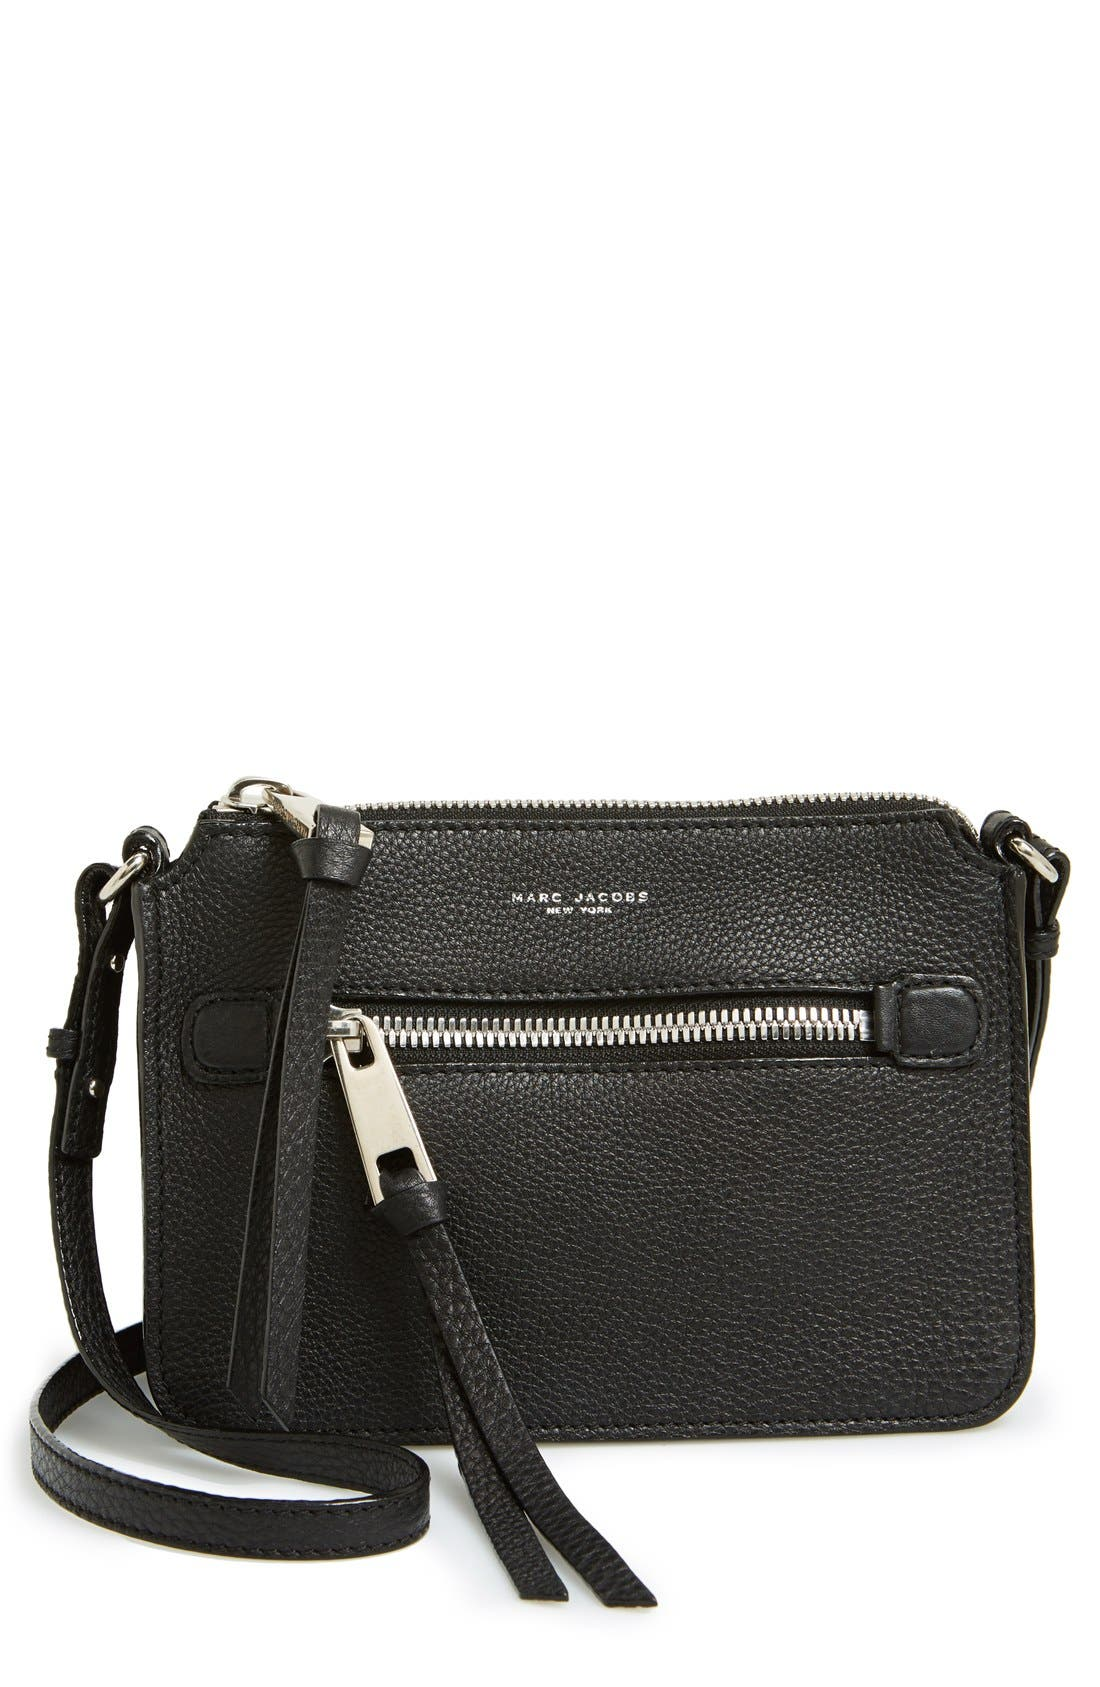 Main Image - MARC JACOBS 'Big Apple' Pouchette Crossbody Bag